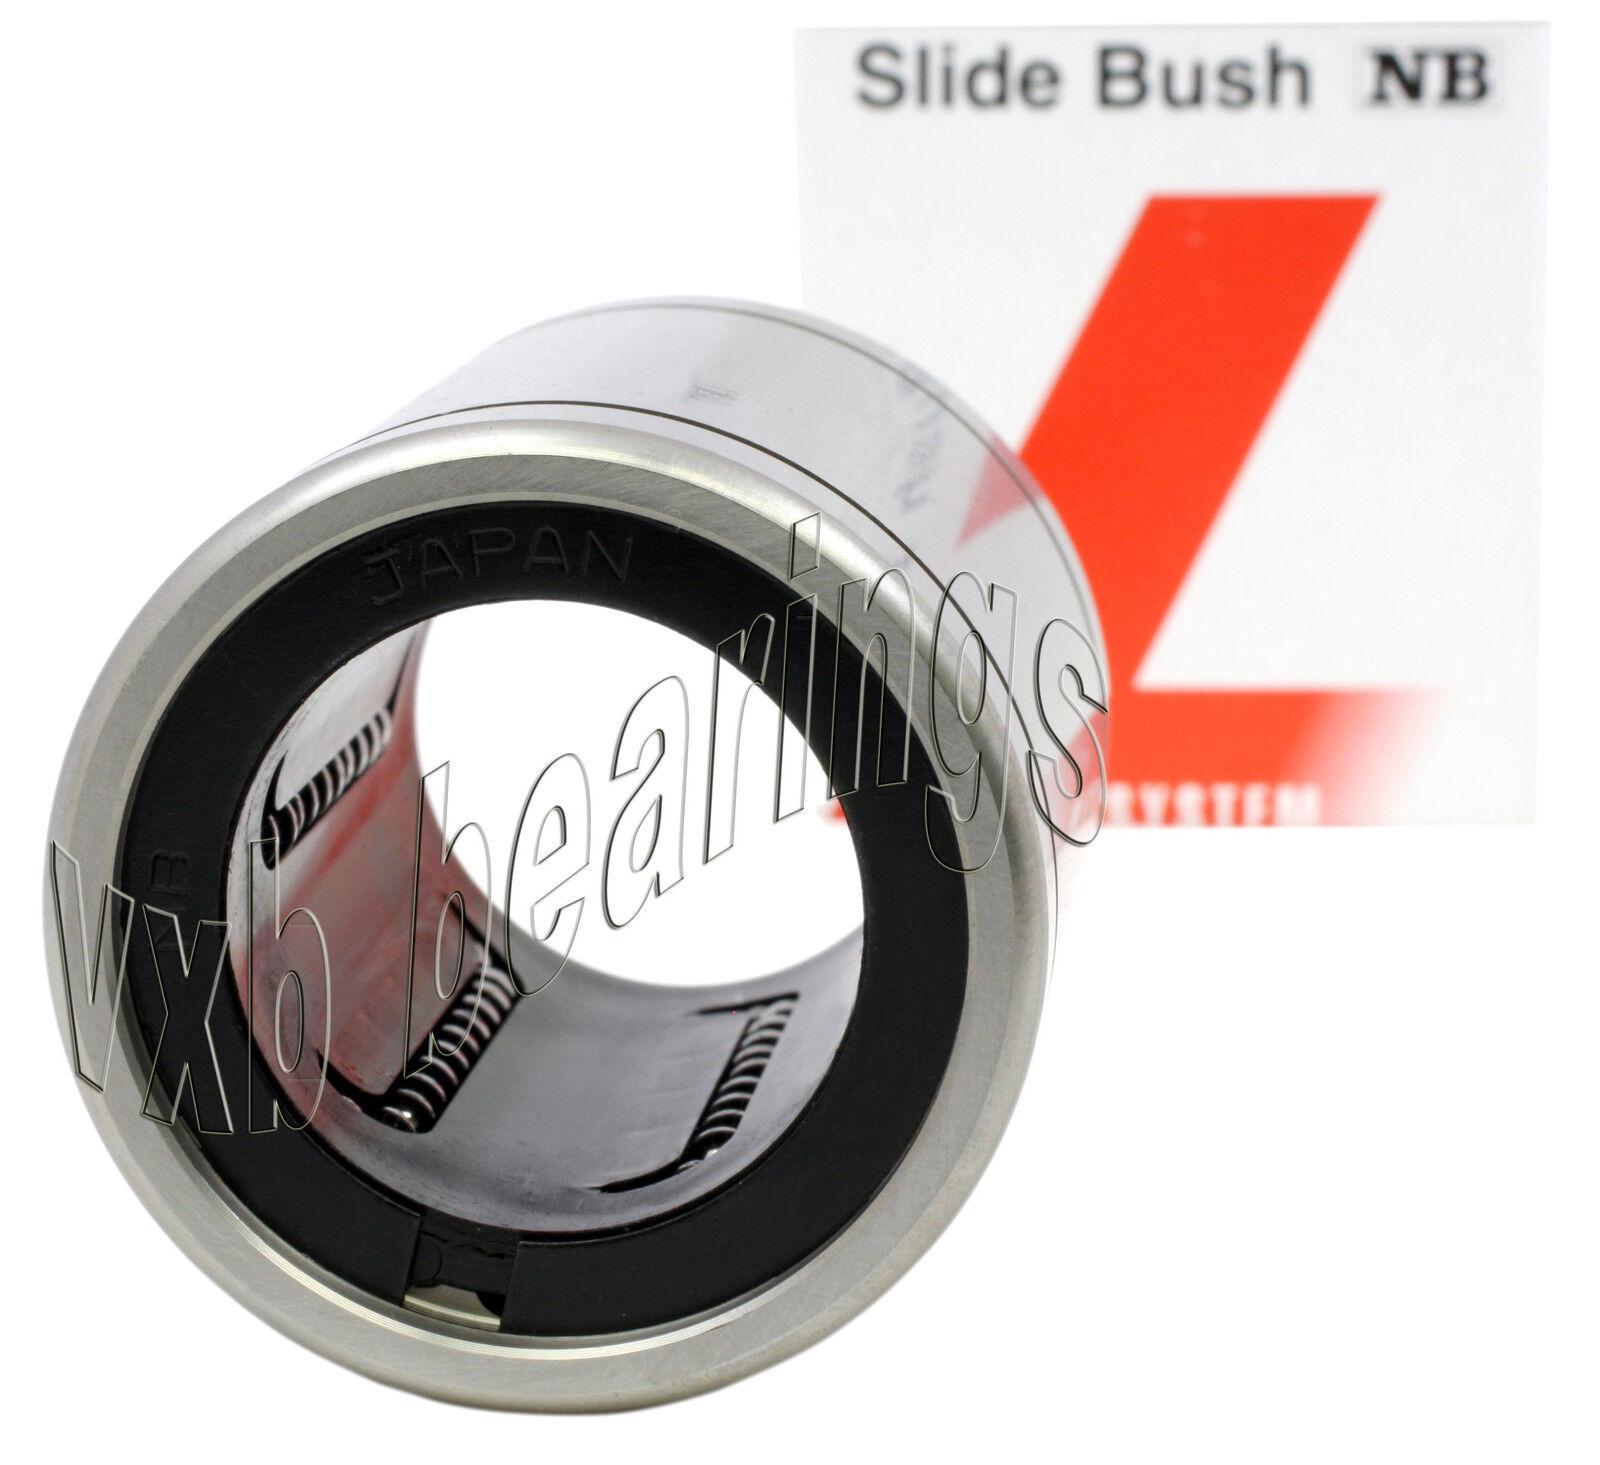 NB Systems SM30GUU 30mm Ball Bushings Linear Motion